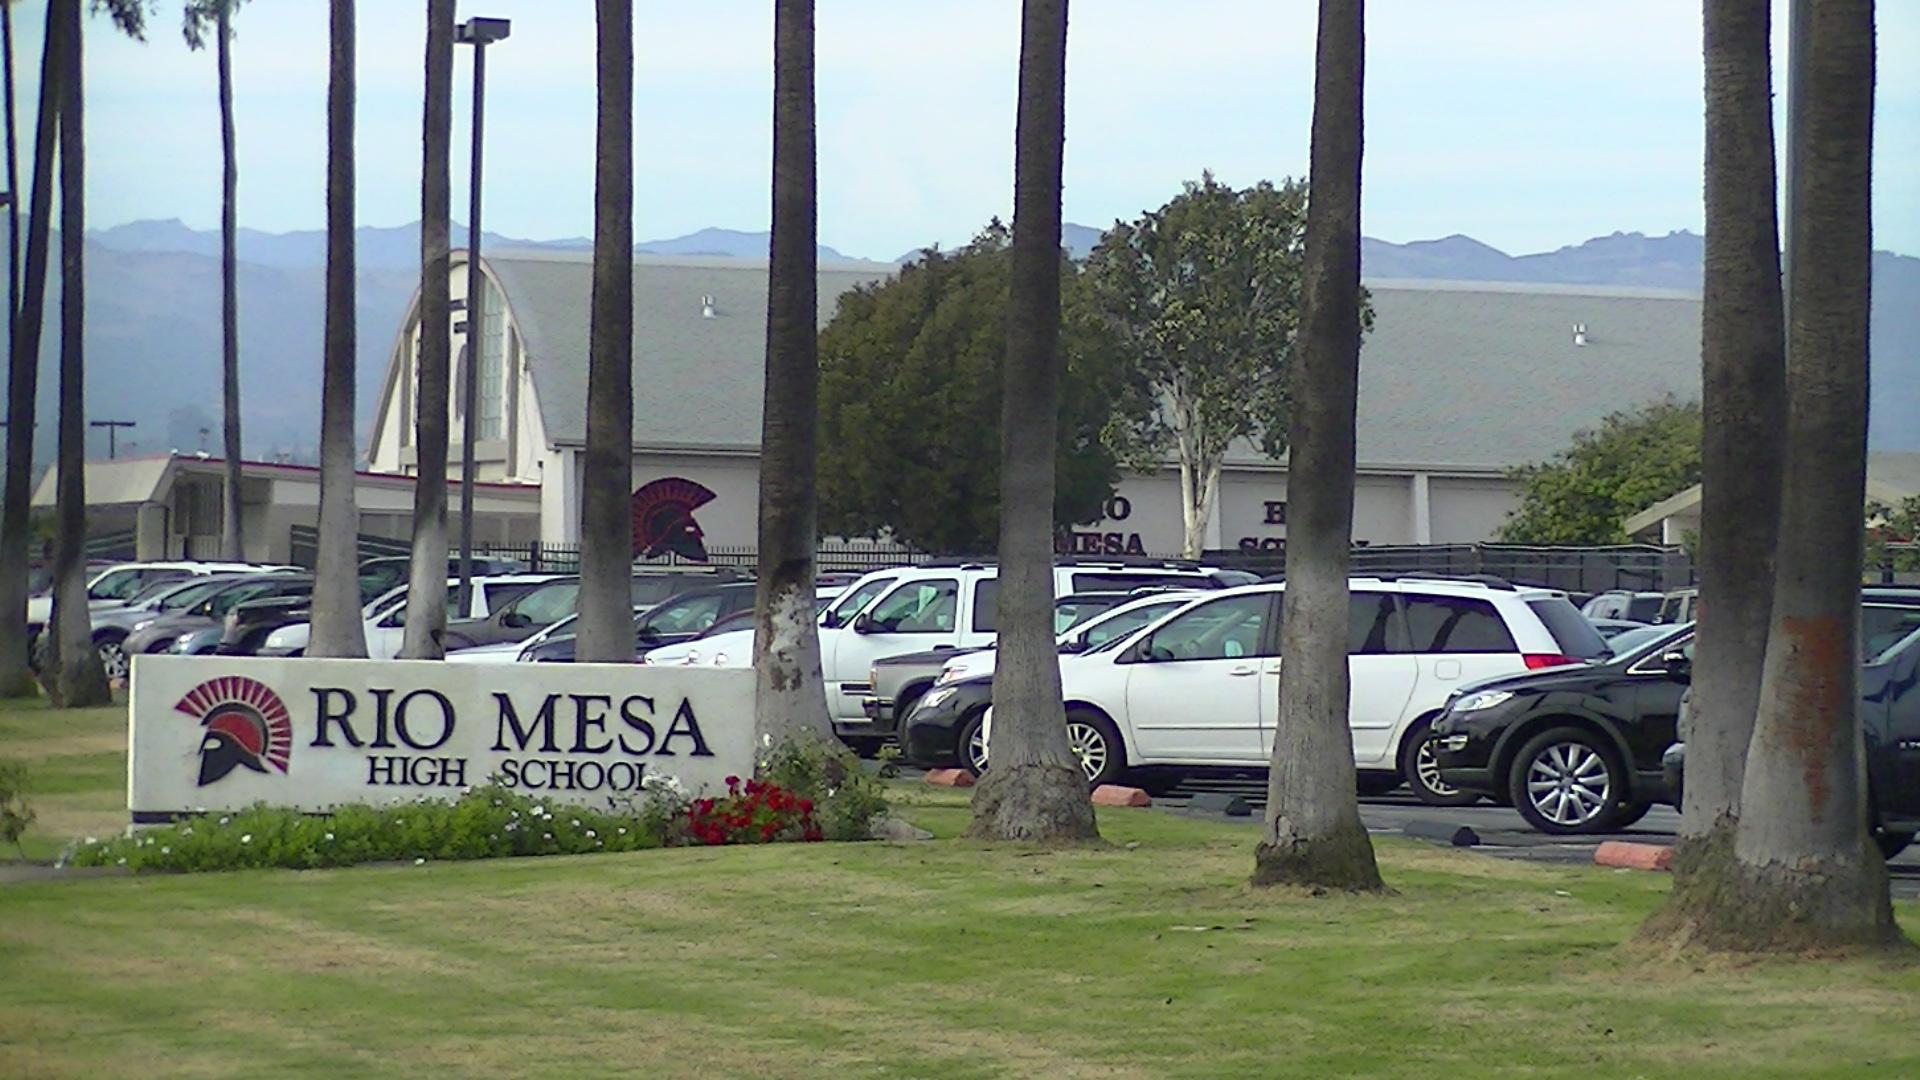 Rio Mesa High School  Wikiwand